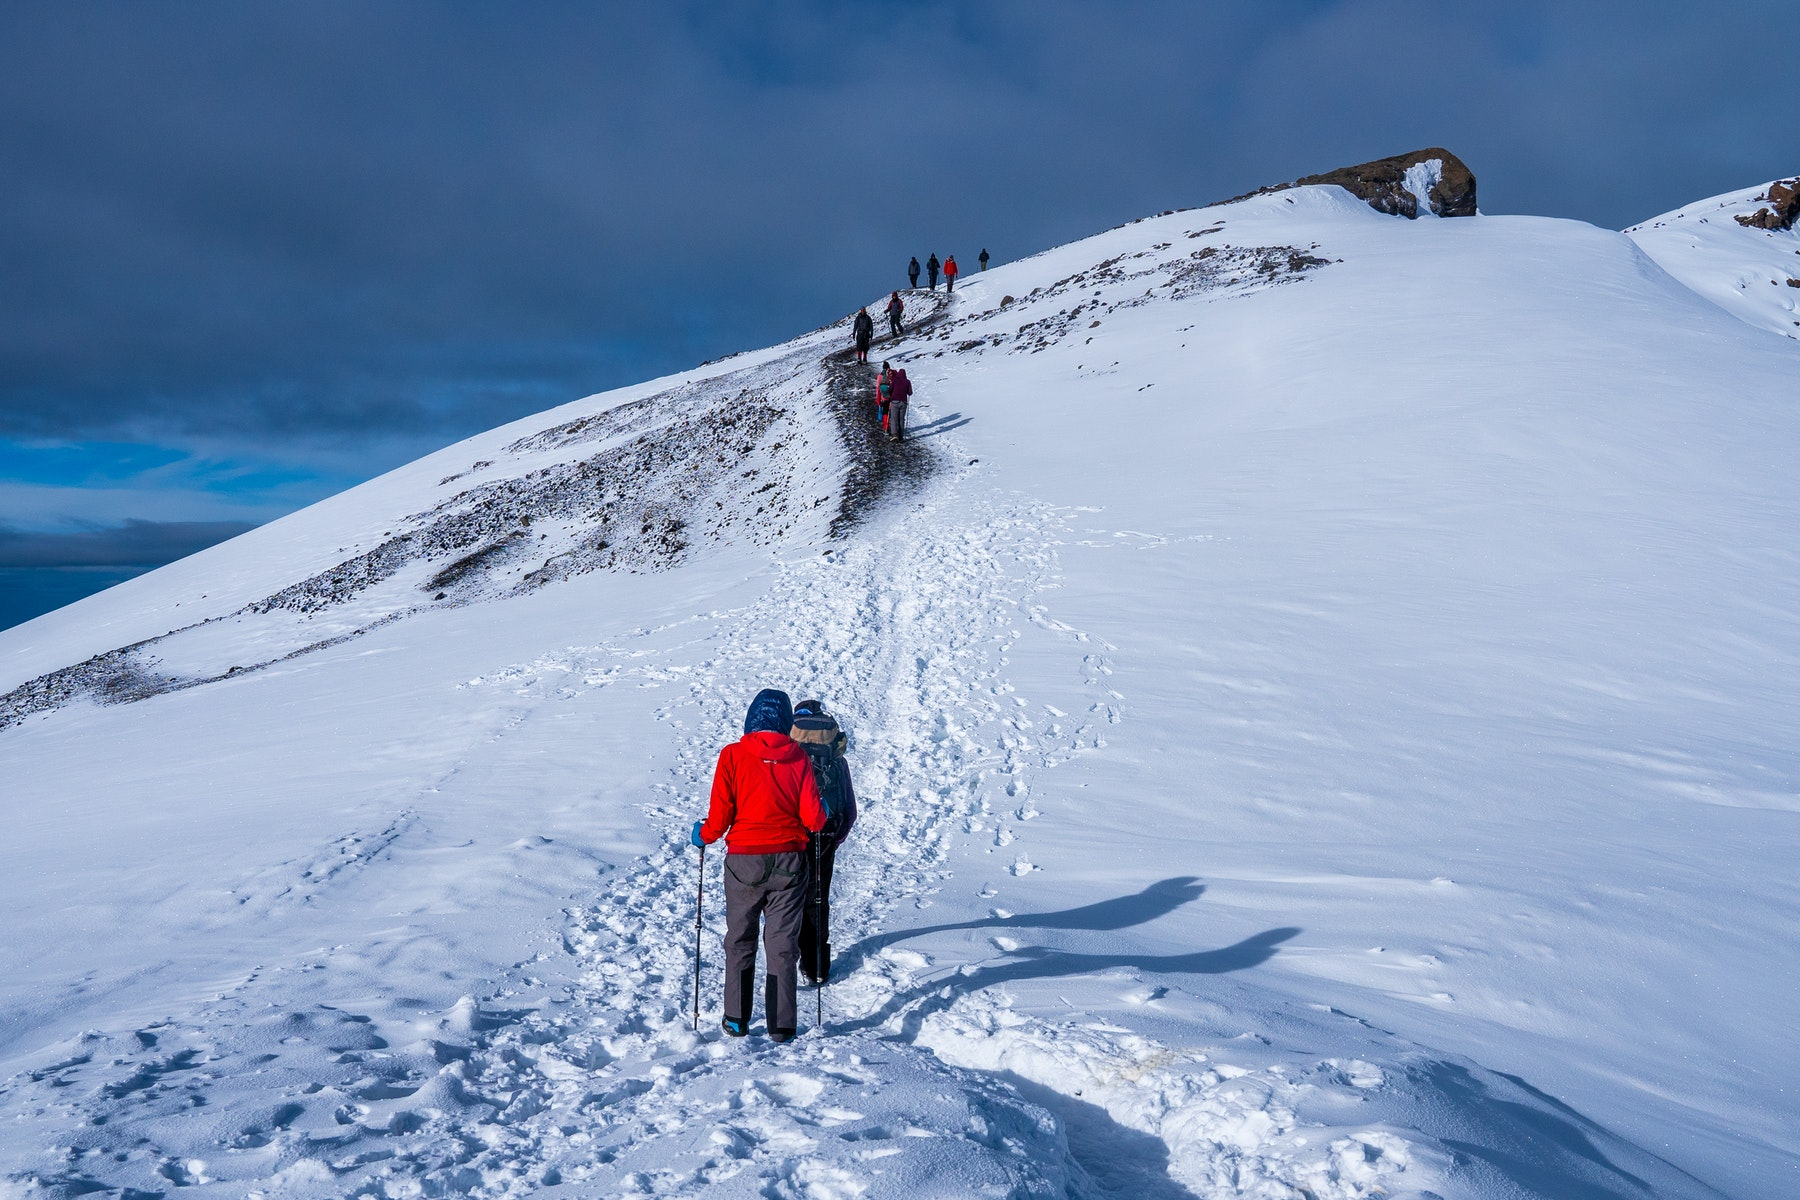 Trekkers hiking among snows and rocks of Kilimanjaro mountain